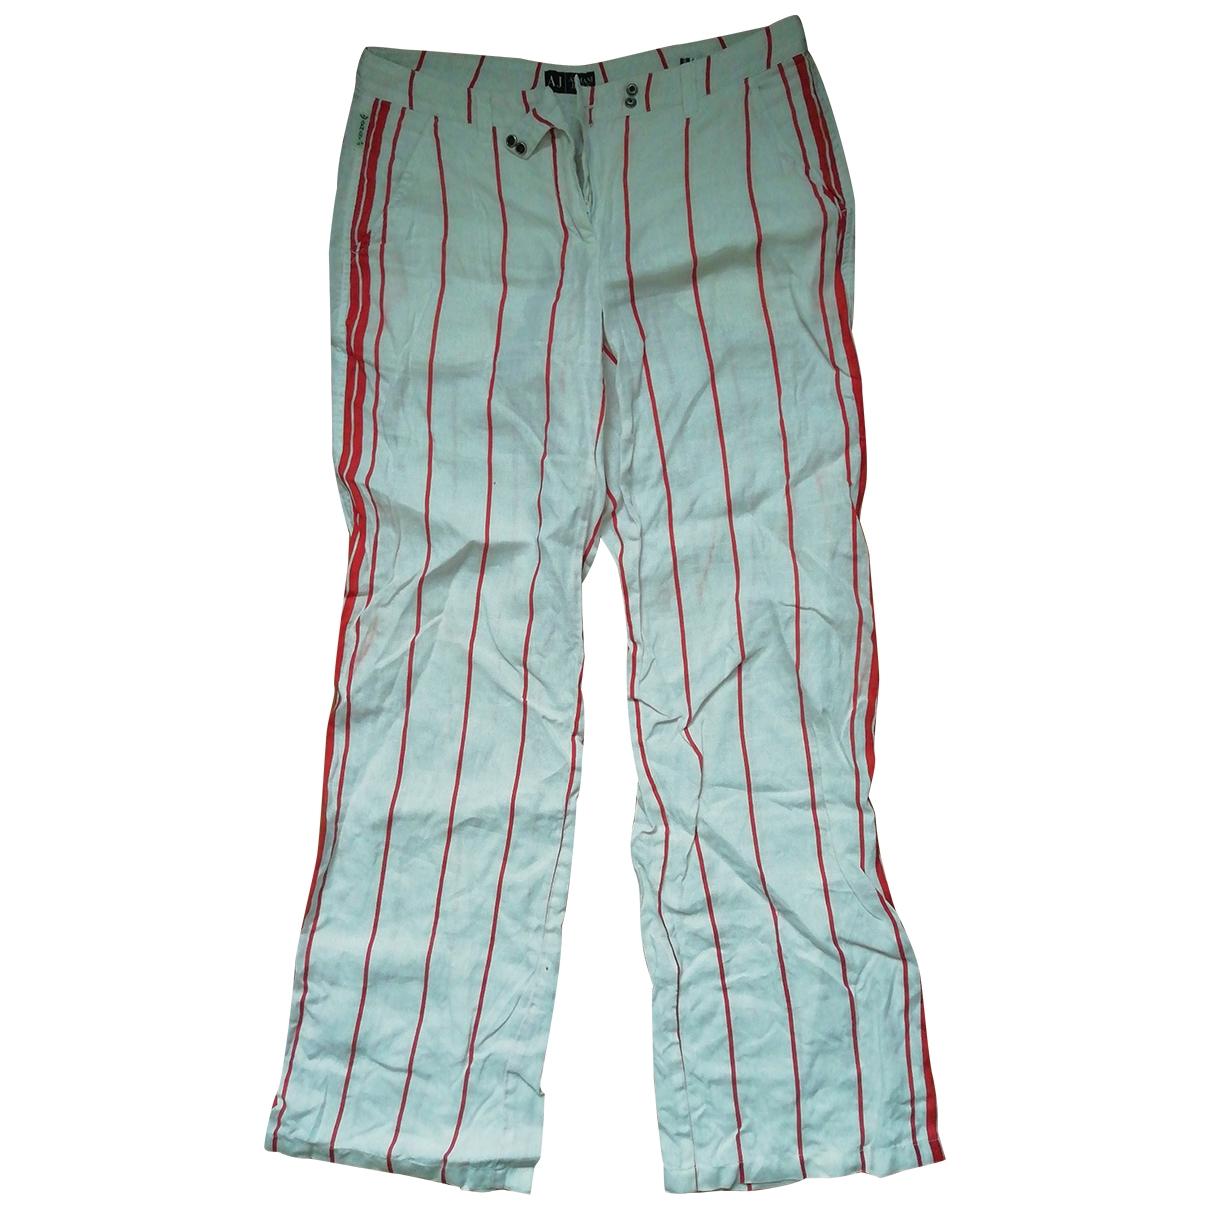 Pantalon de Lona Armani Jeans